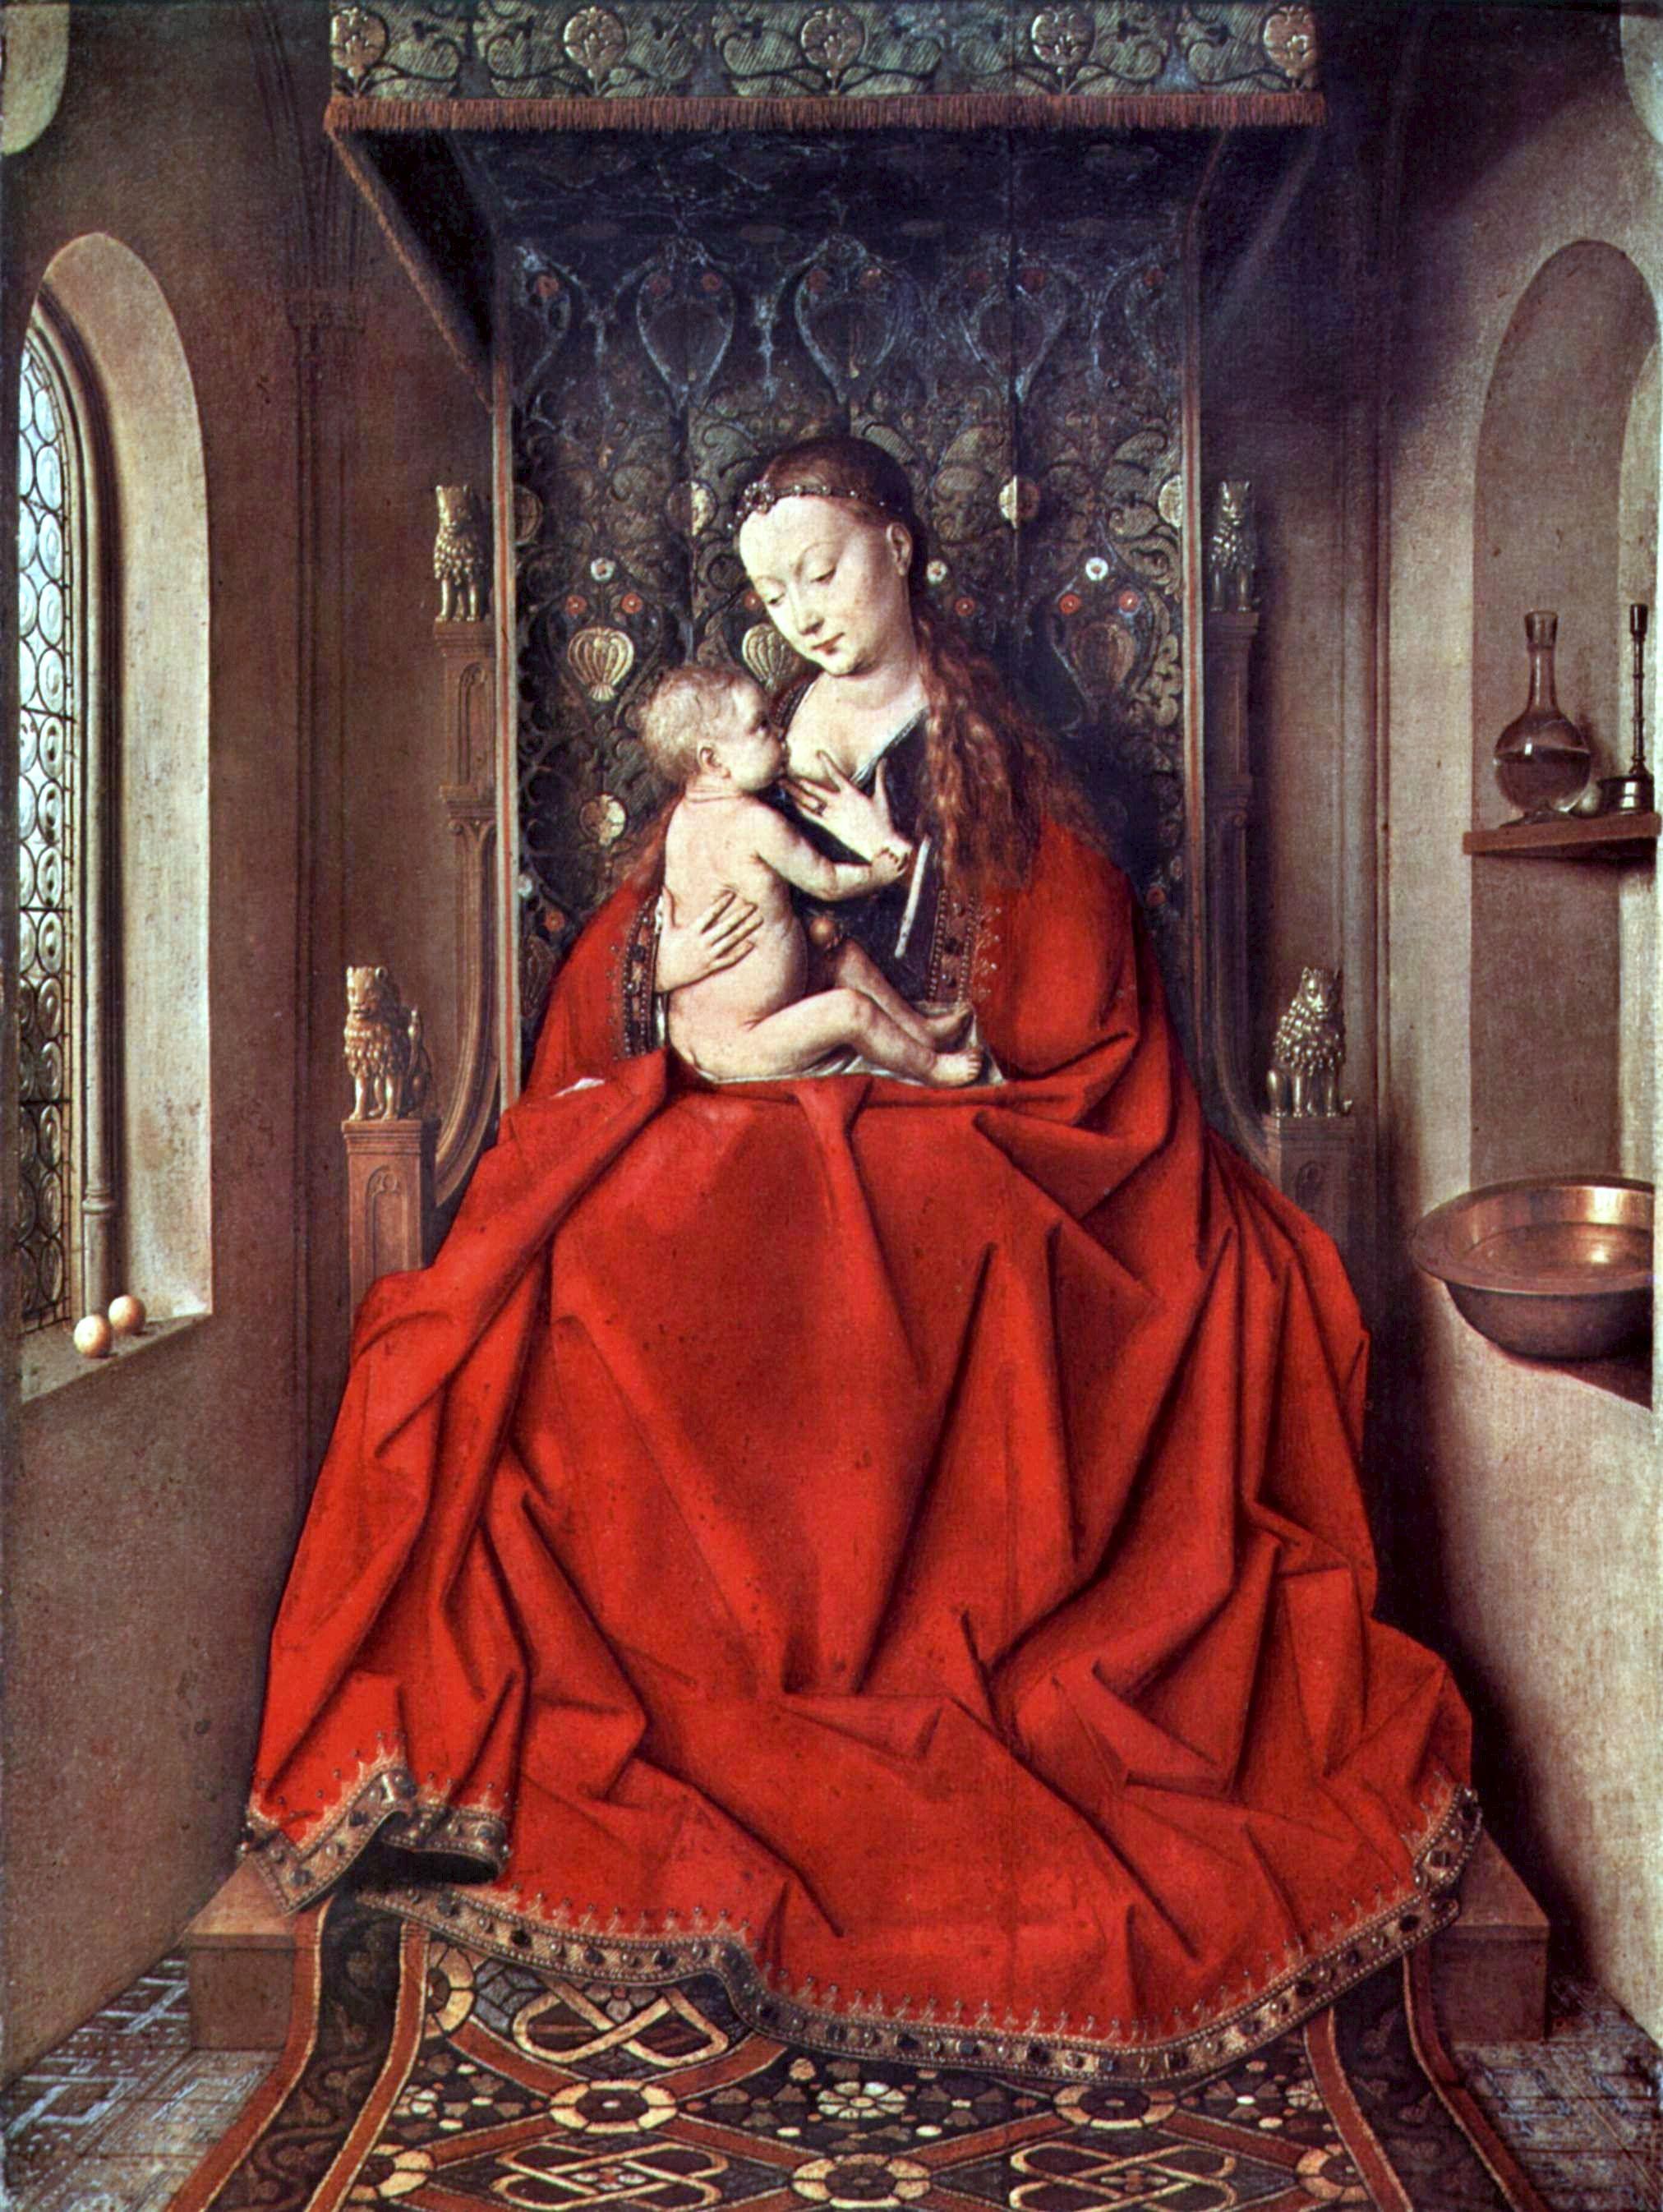 File:Jan van Eyck 076.jpg - Wikimedia Commons